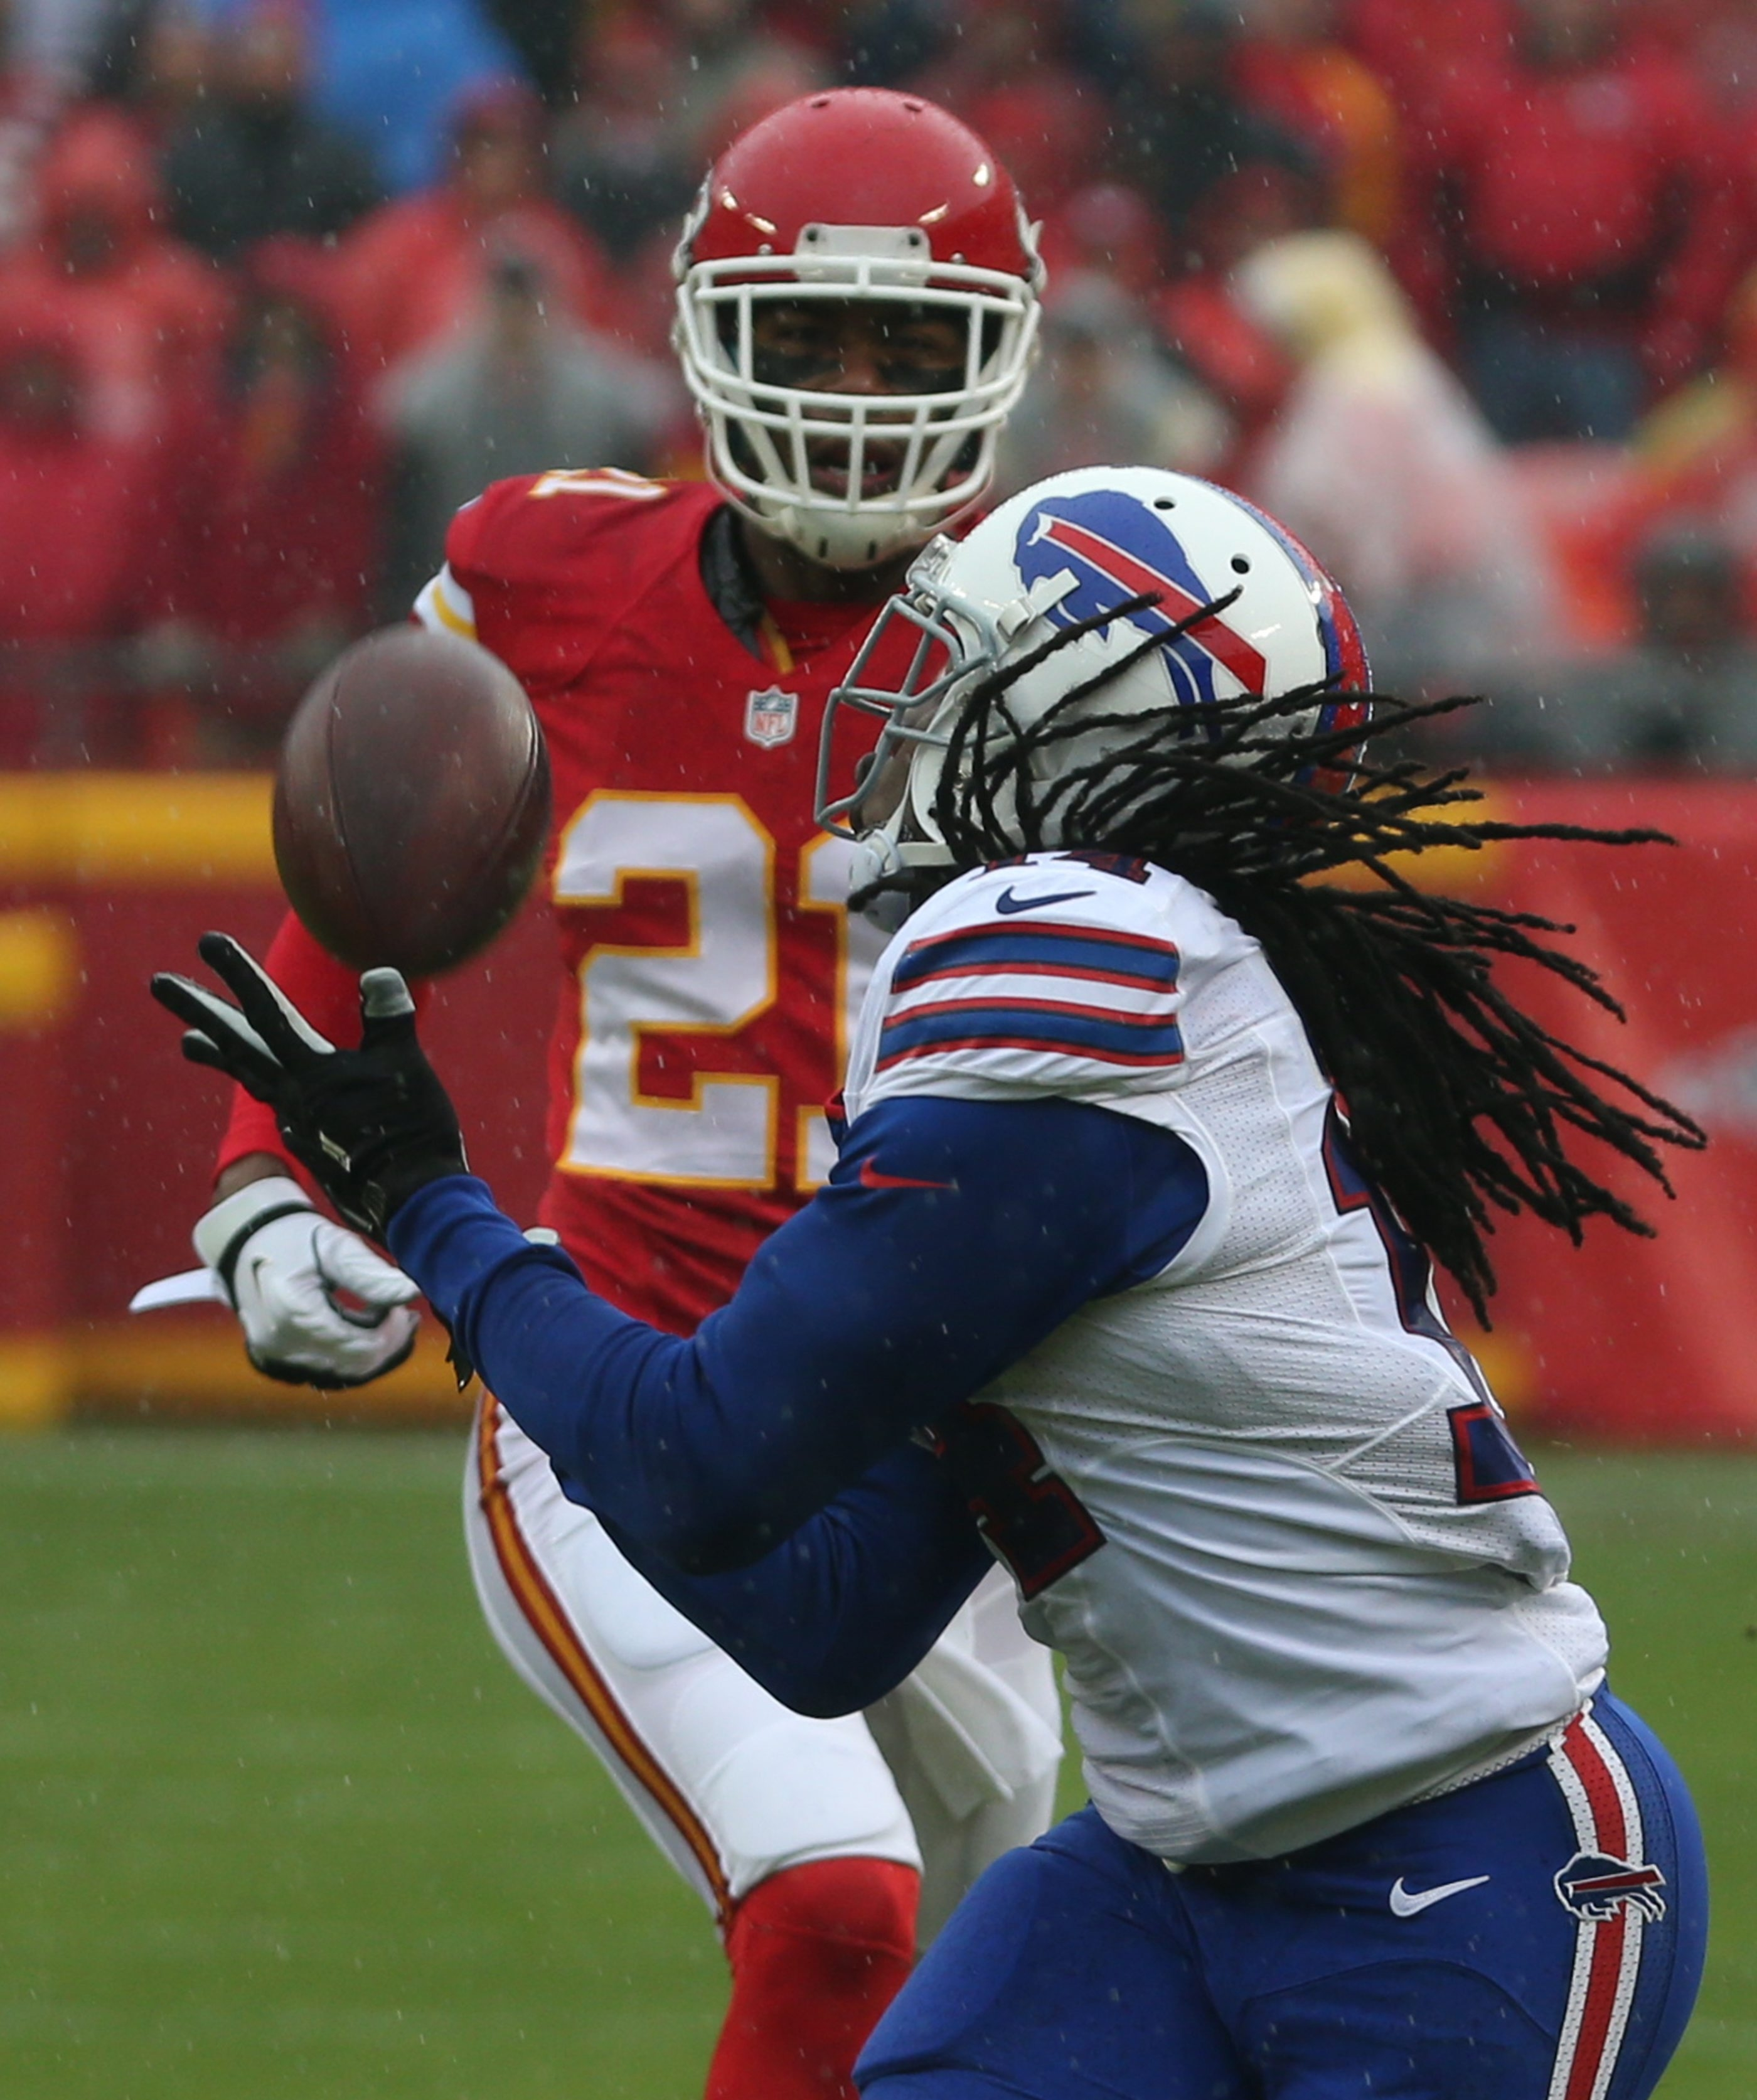 Bills receiver Sammy Watkins beats Chiefs cornerback Sean Smith in the first quarter. Watkins had 158 yards receiving in the first half, but no catches in the second half.